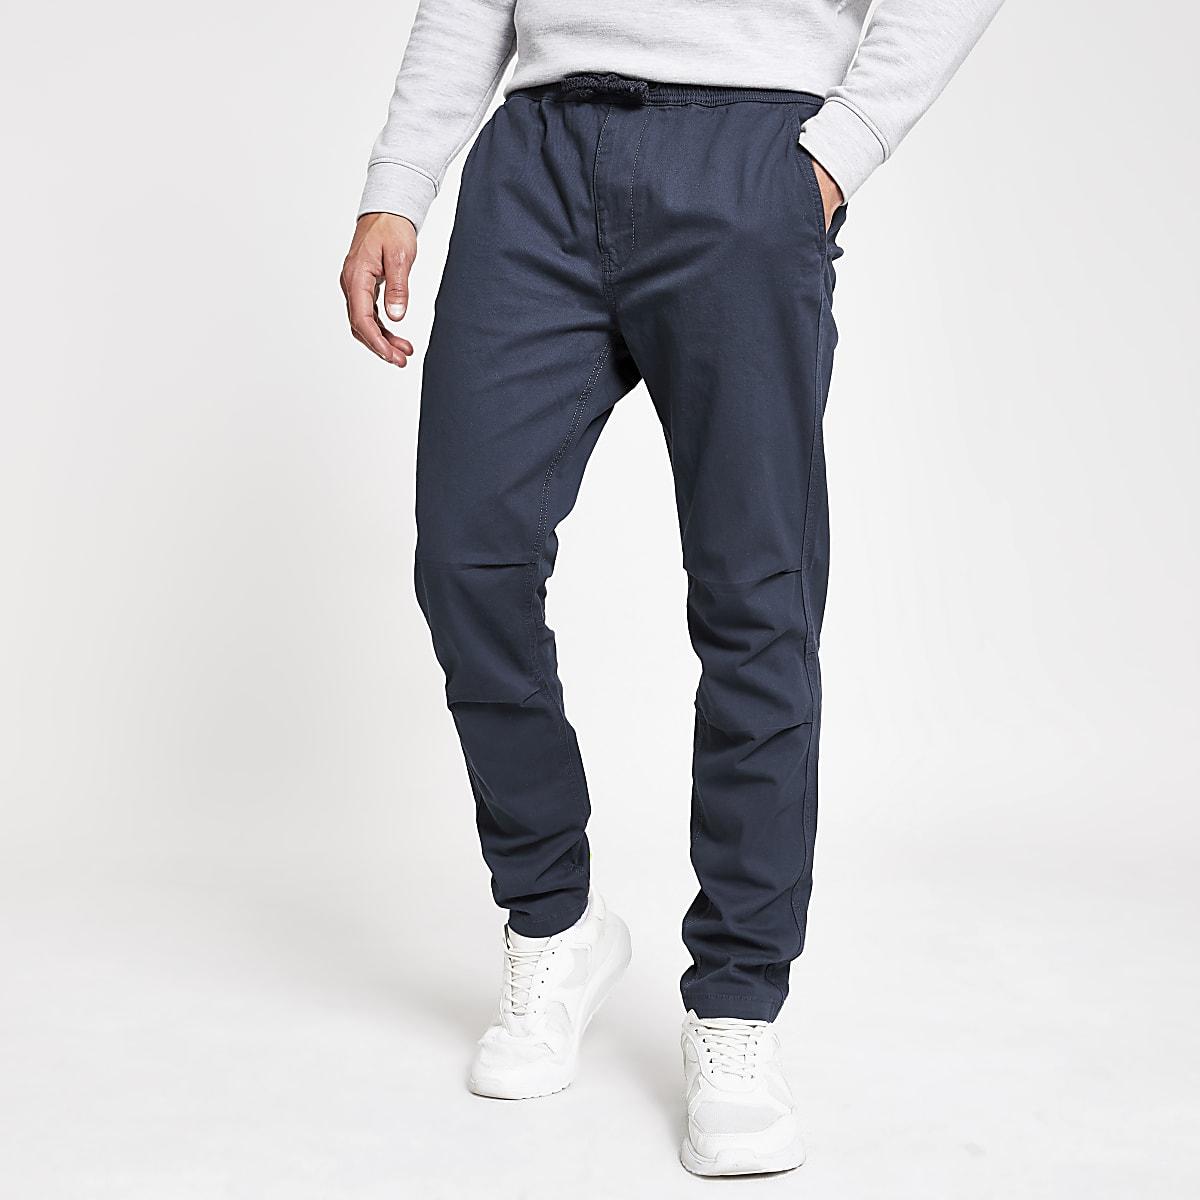 Superdry blue utility pants